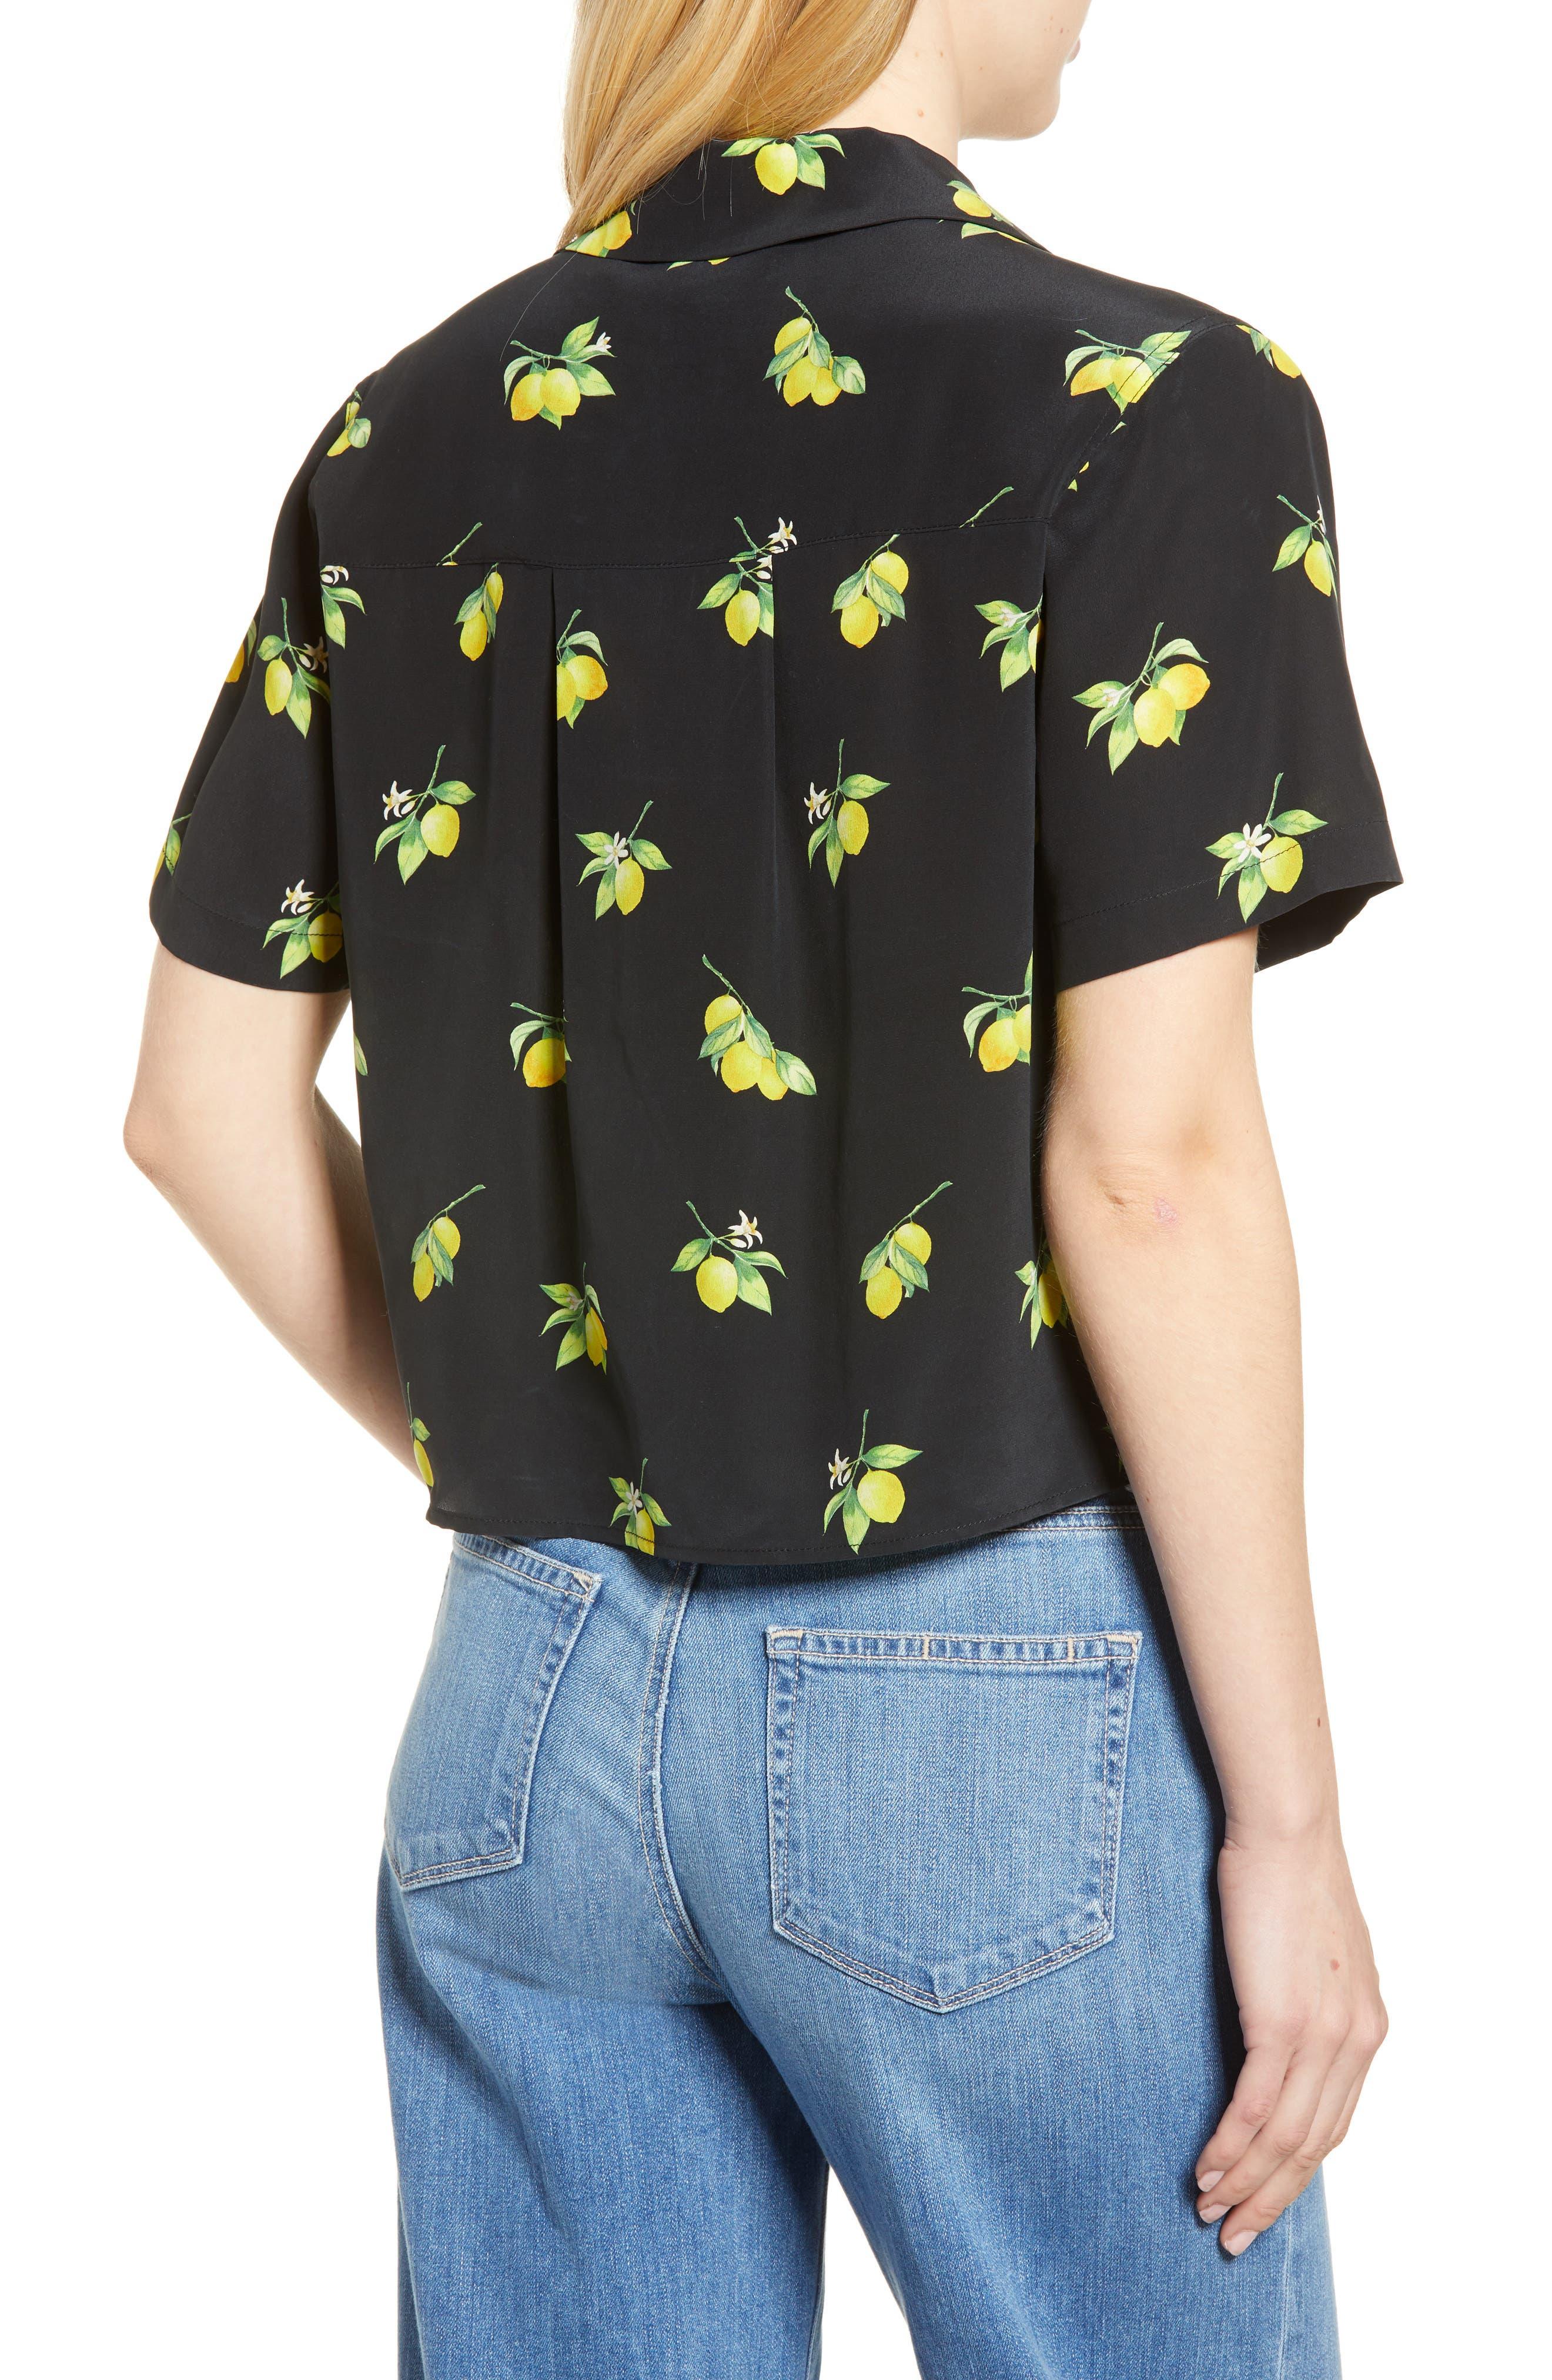 Maui Silk Shirt,                             Alternate thumbnail 2, color,                             001